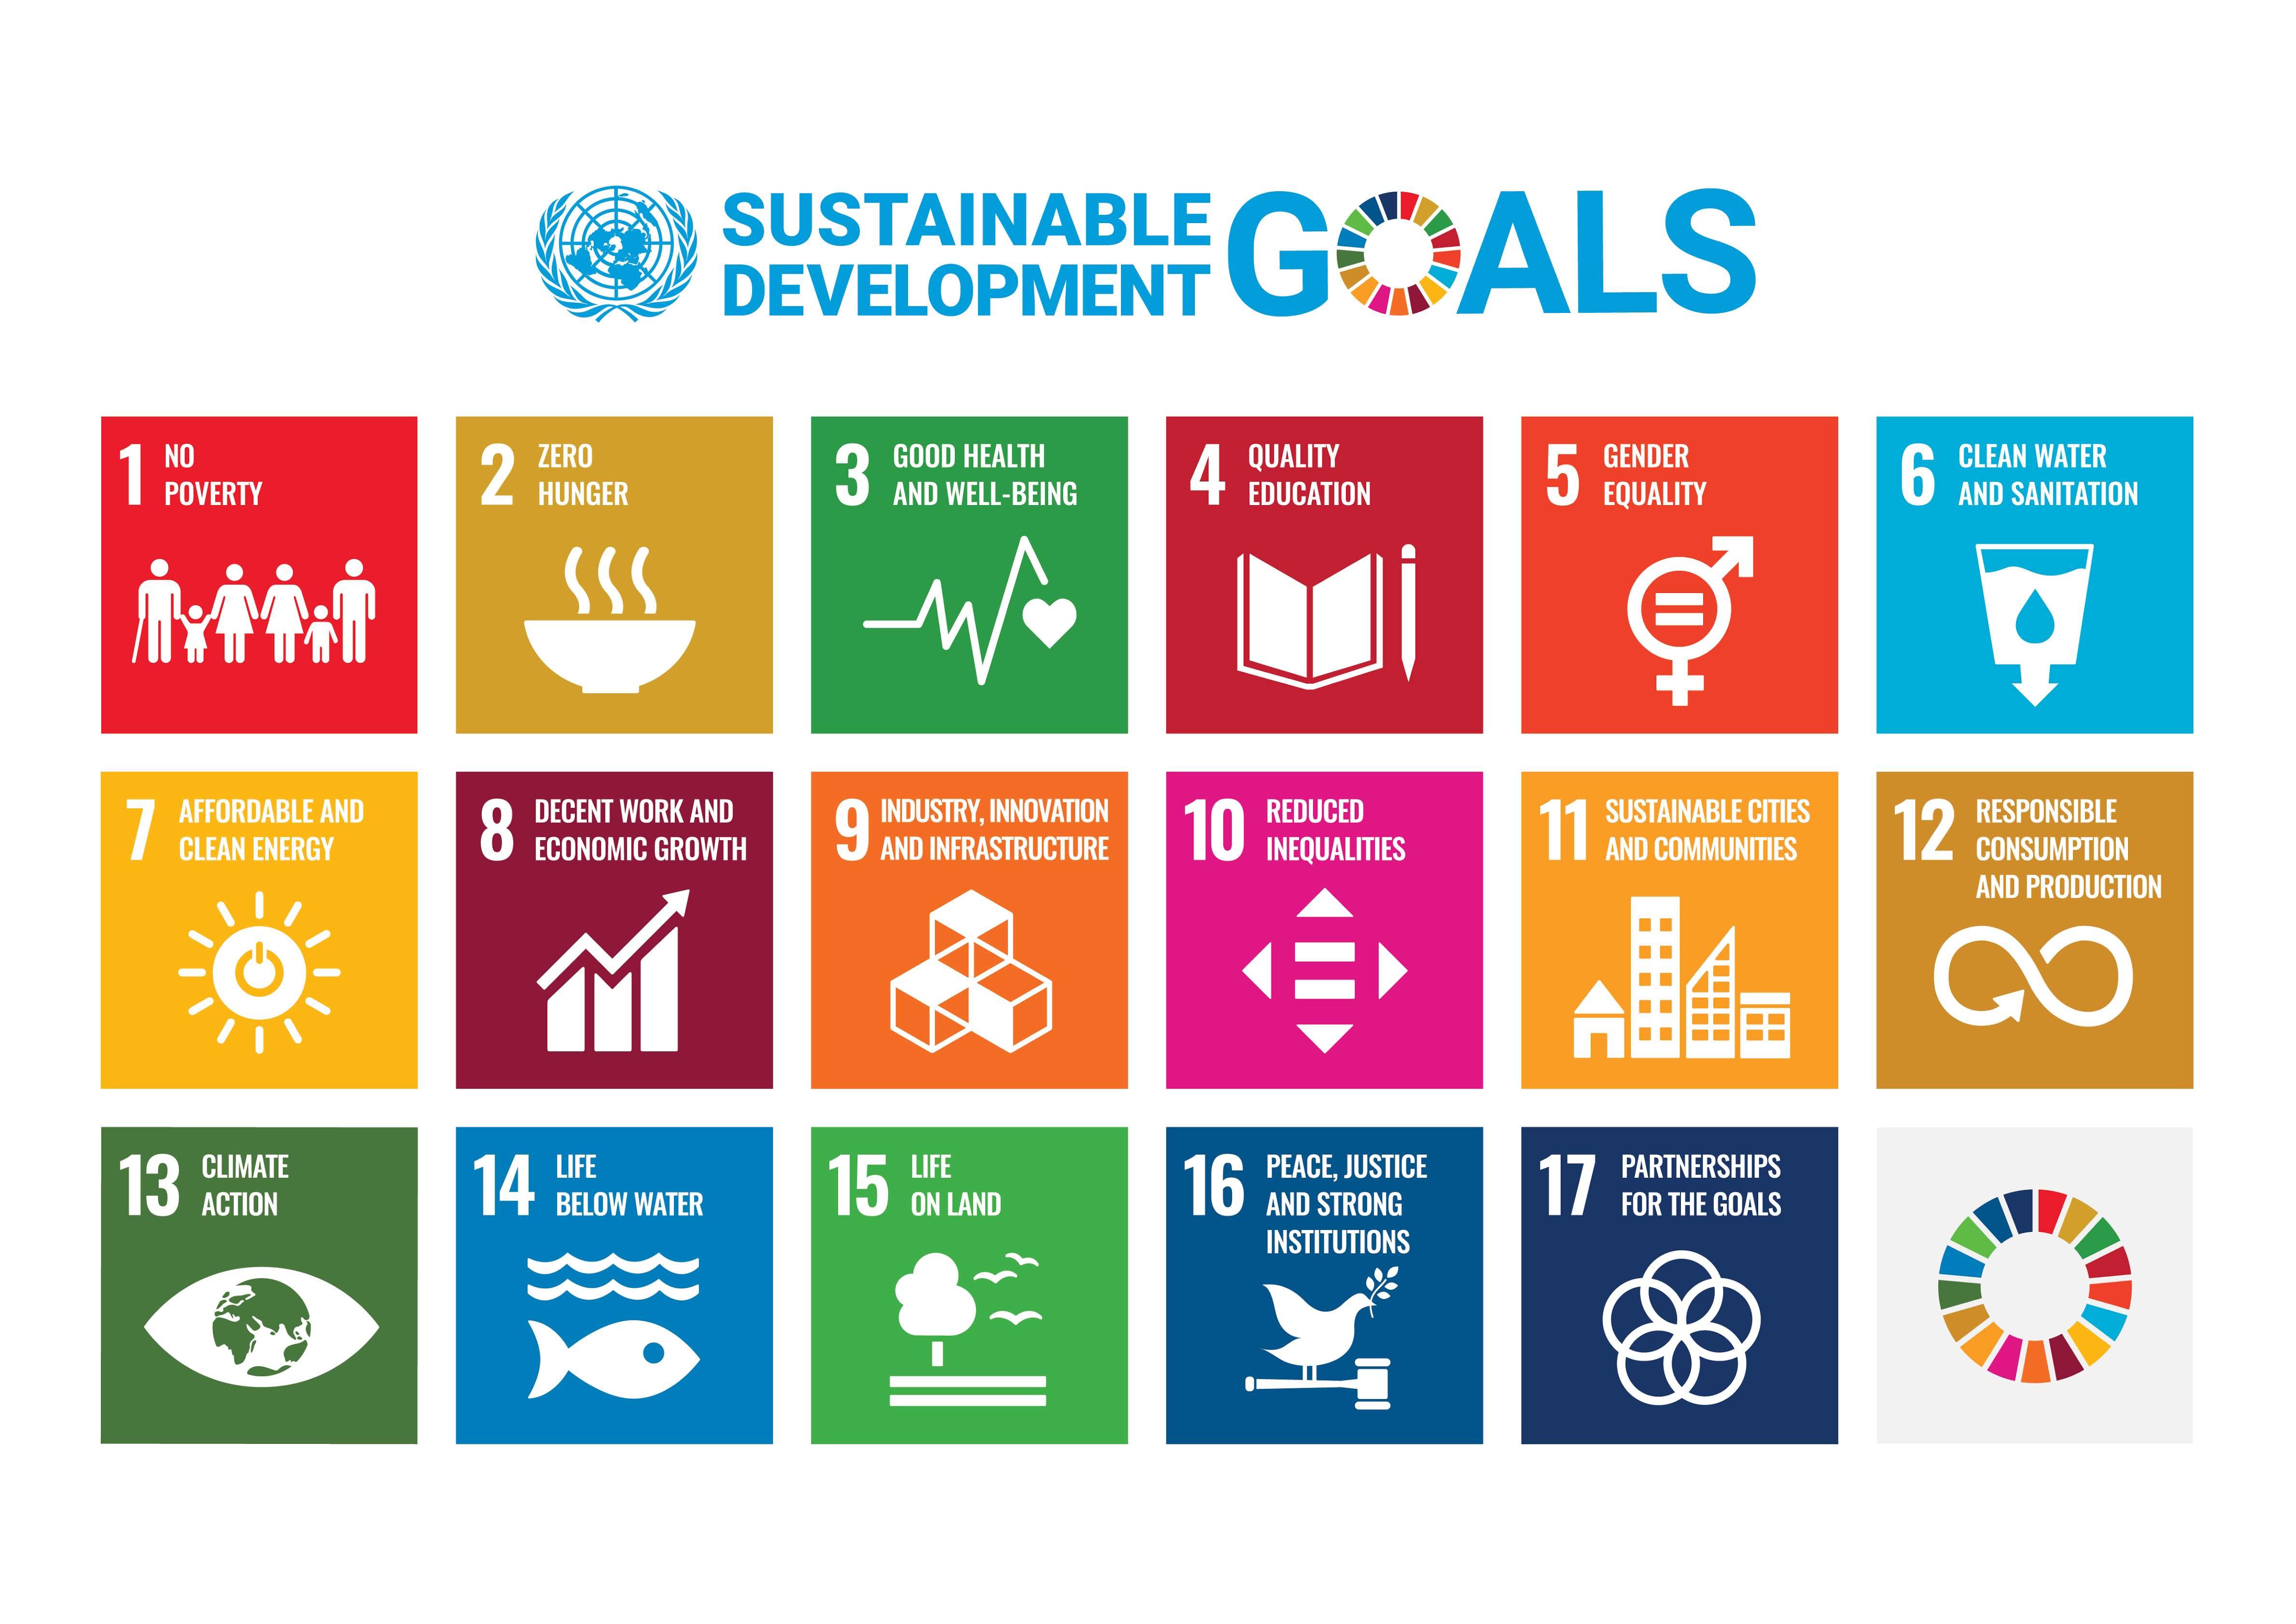 Sustainable Development Goals Poster with UN Emblem